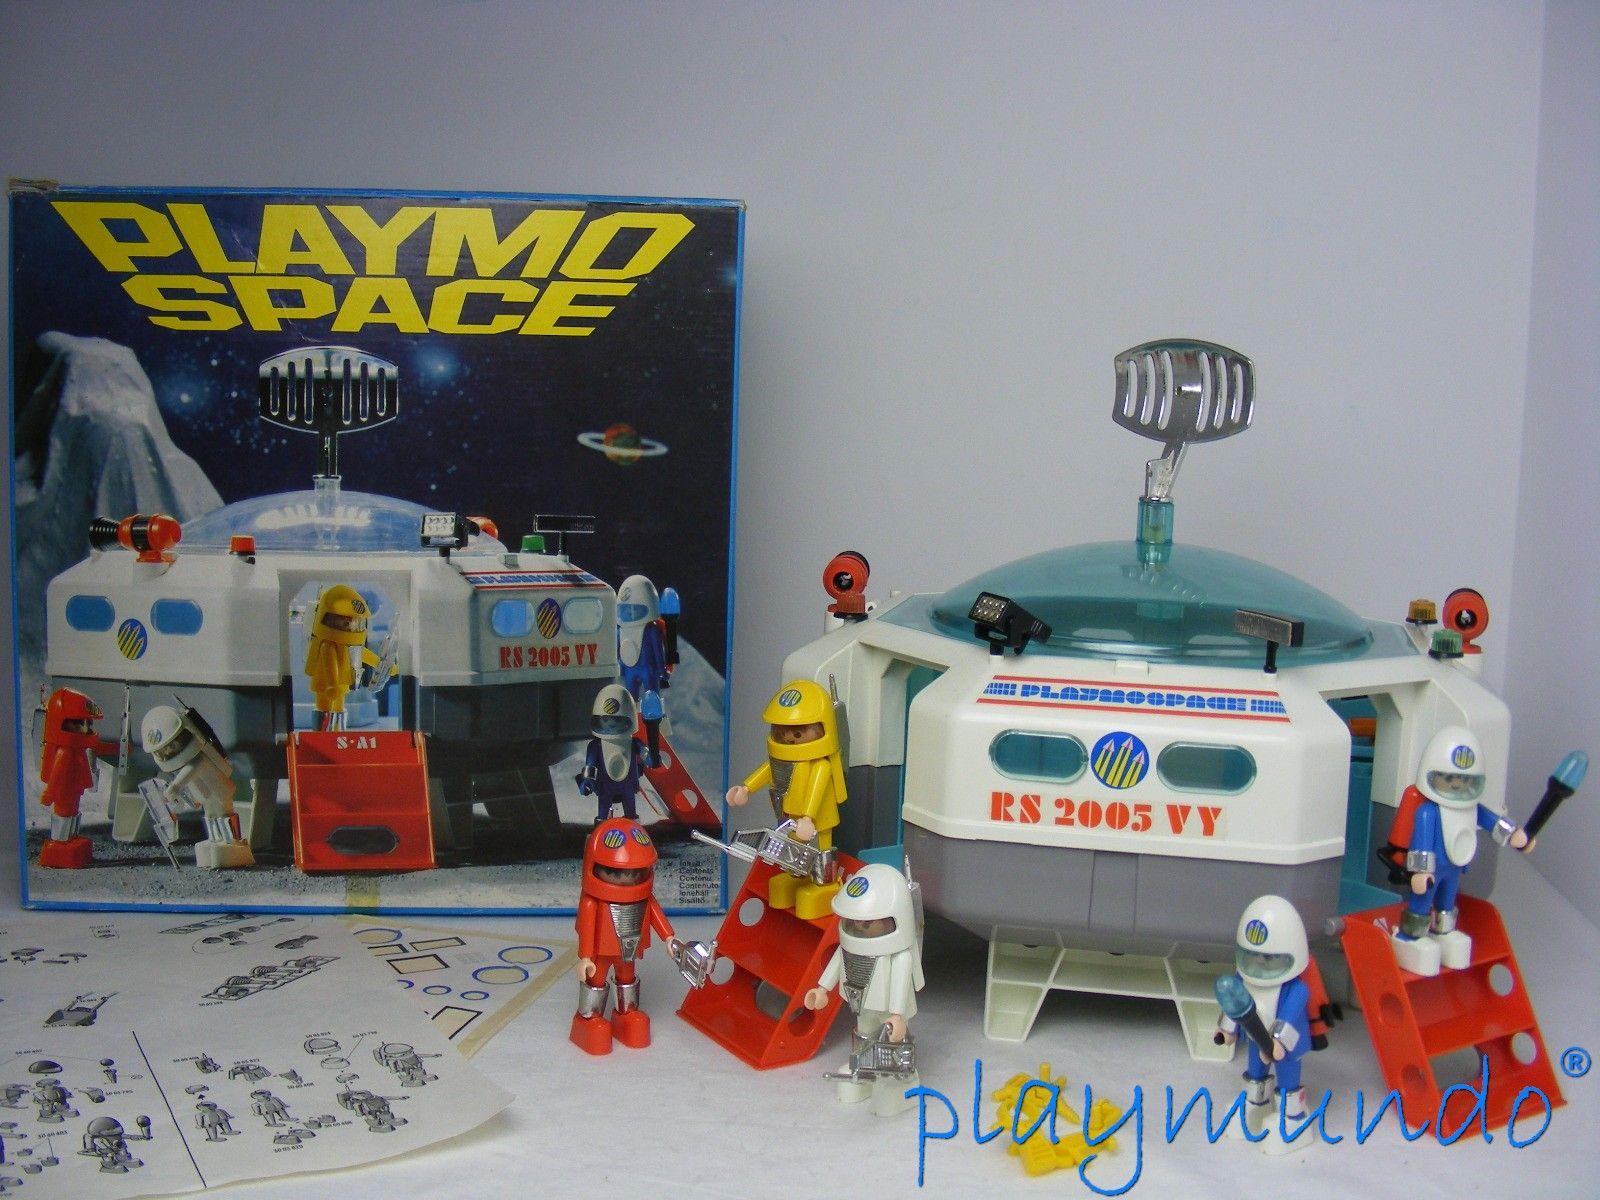 Playmobil 3536 nave espacial version 1 a o 1980 http for Nave espacial playmobil